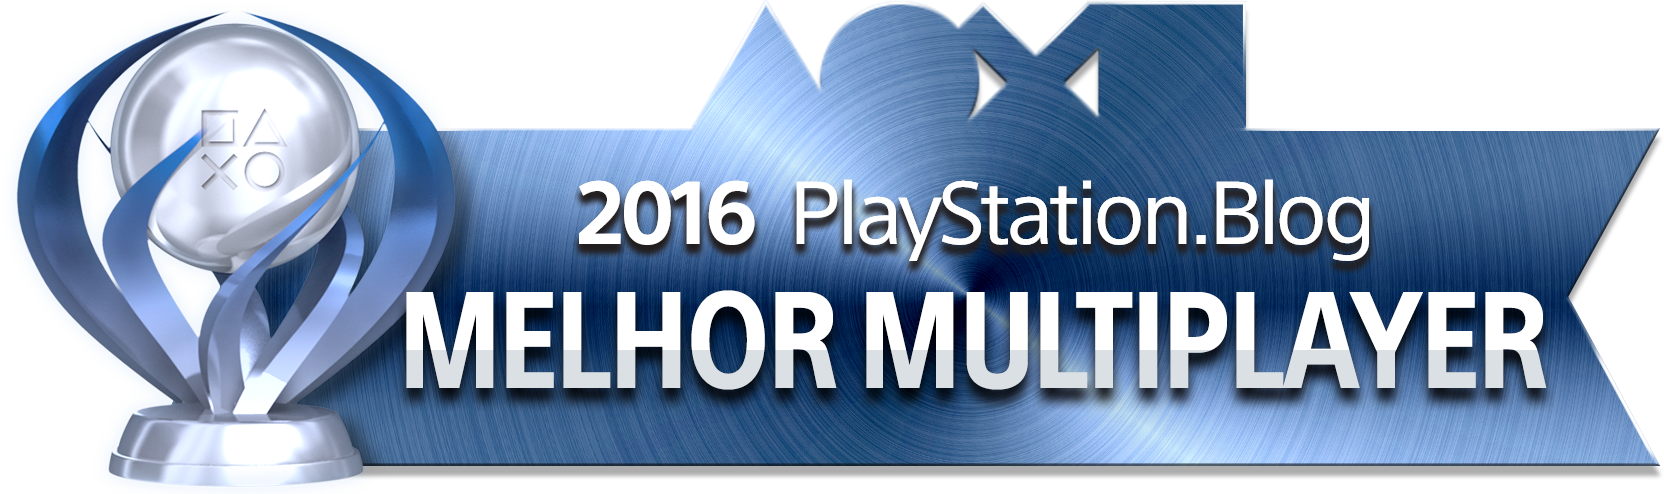 Melhor Multiplayer - Platina